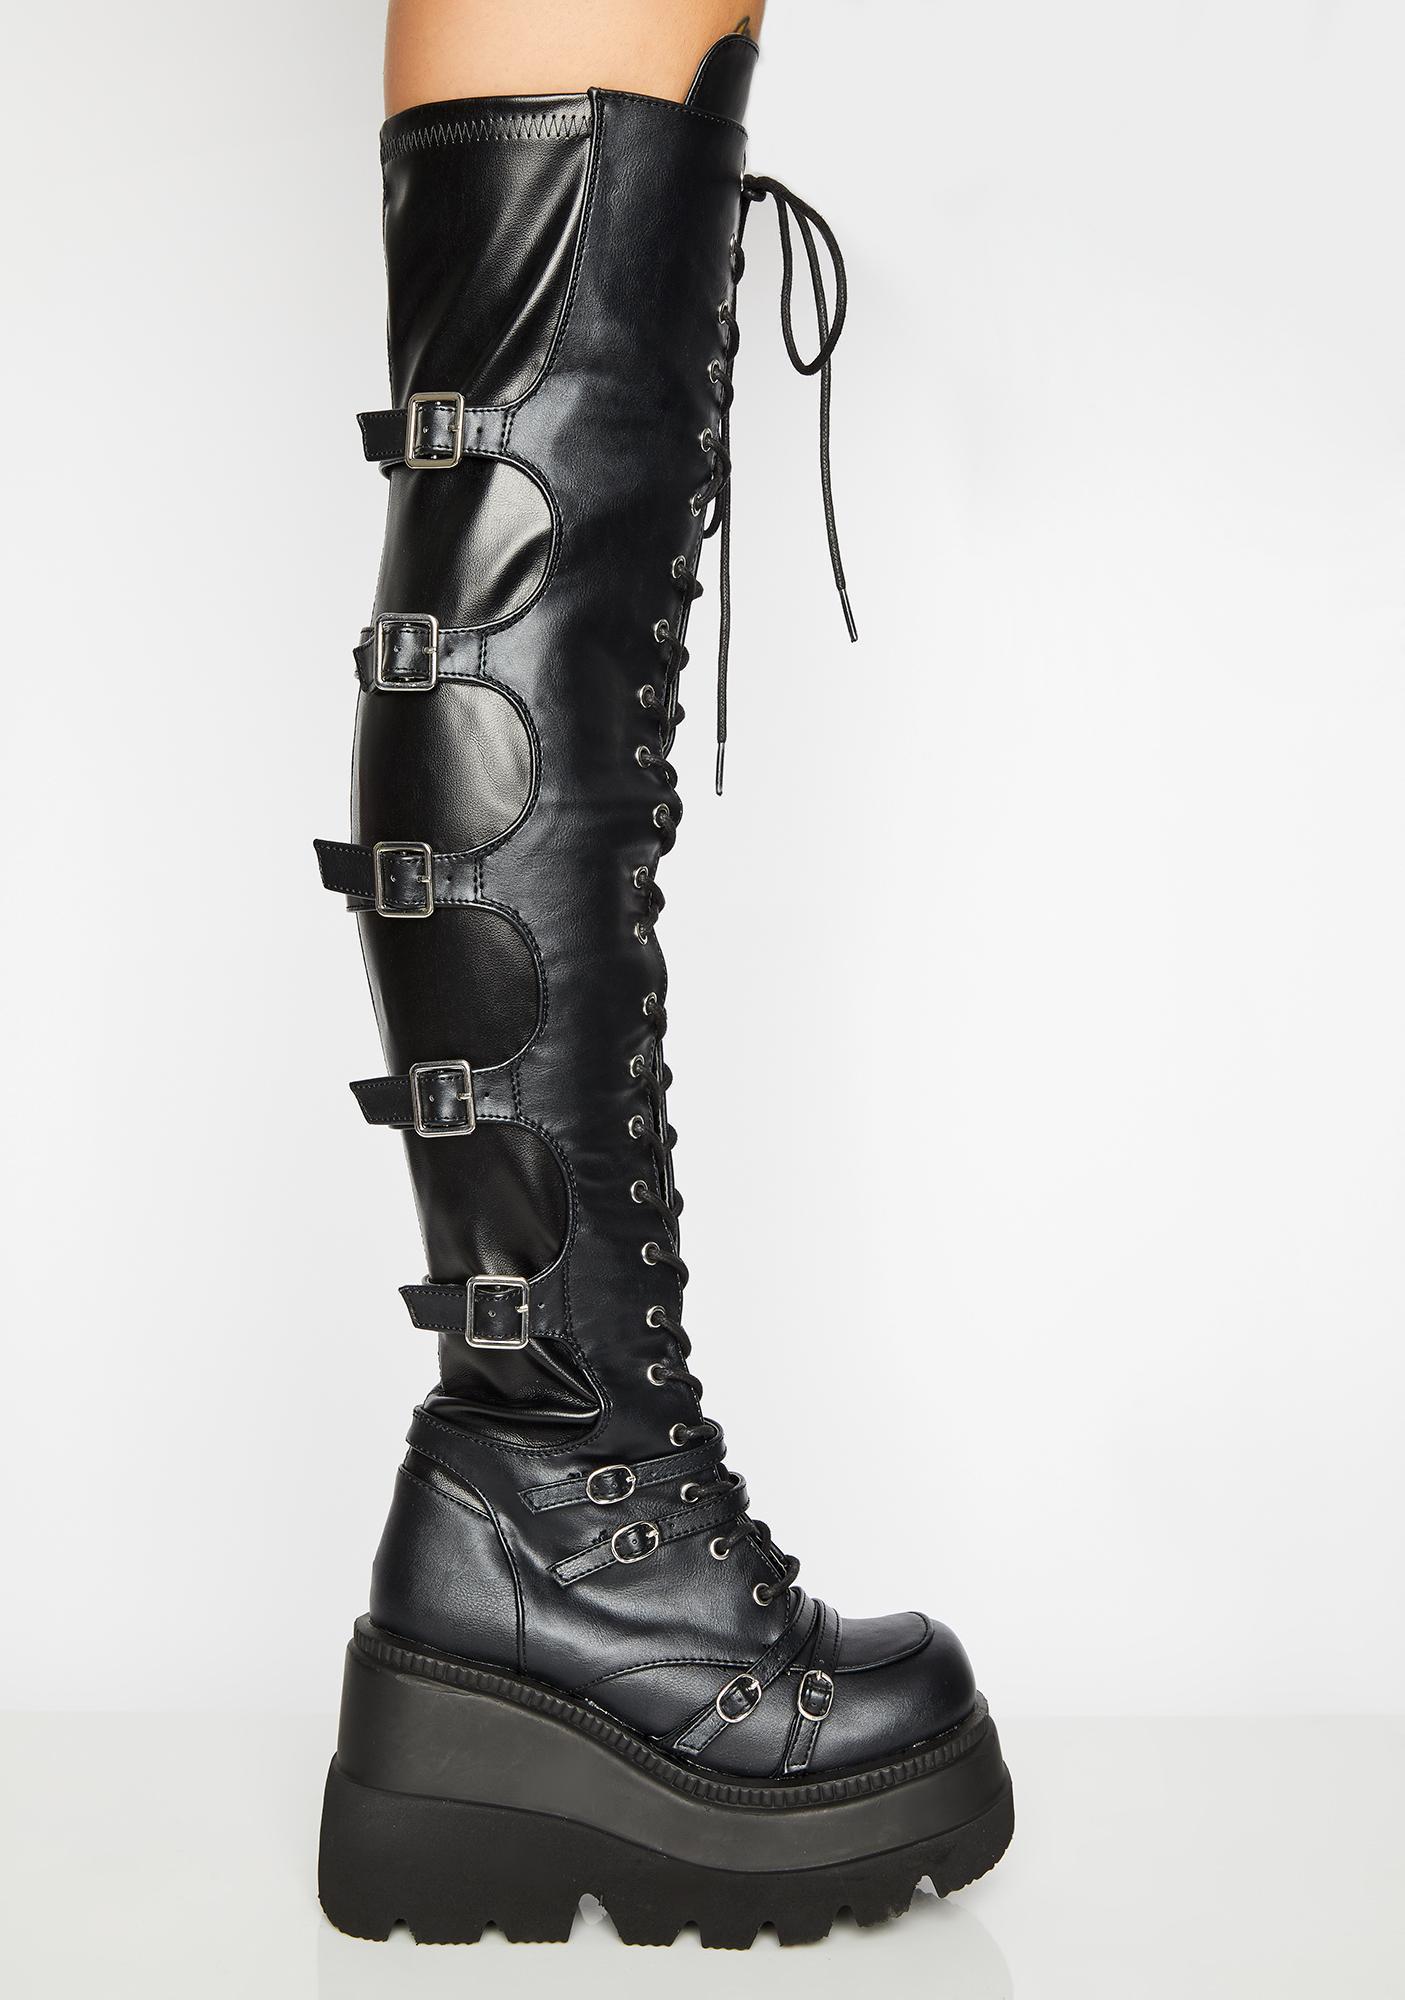 Demonia Earth Shaker Platform Boots